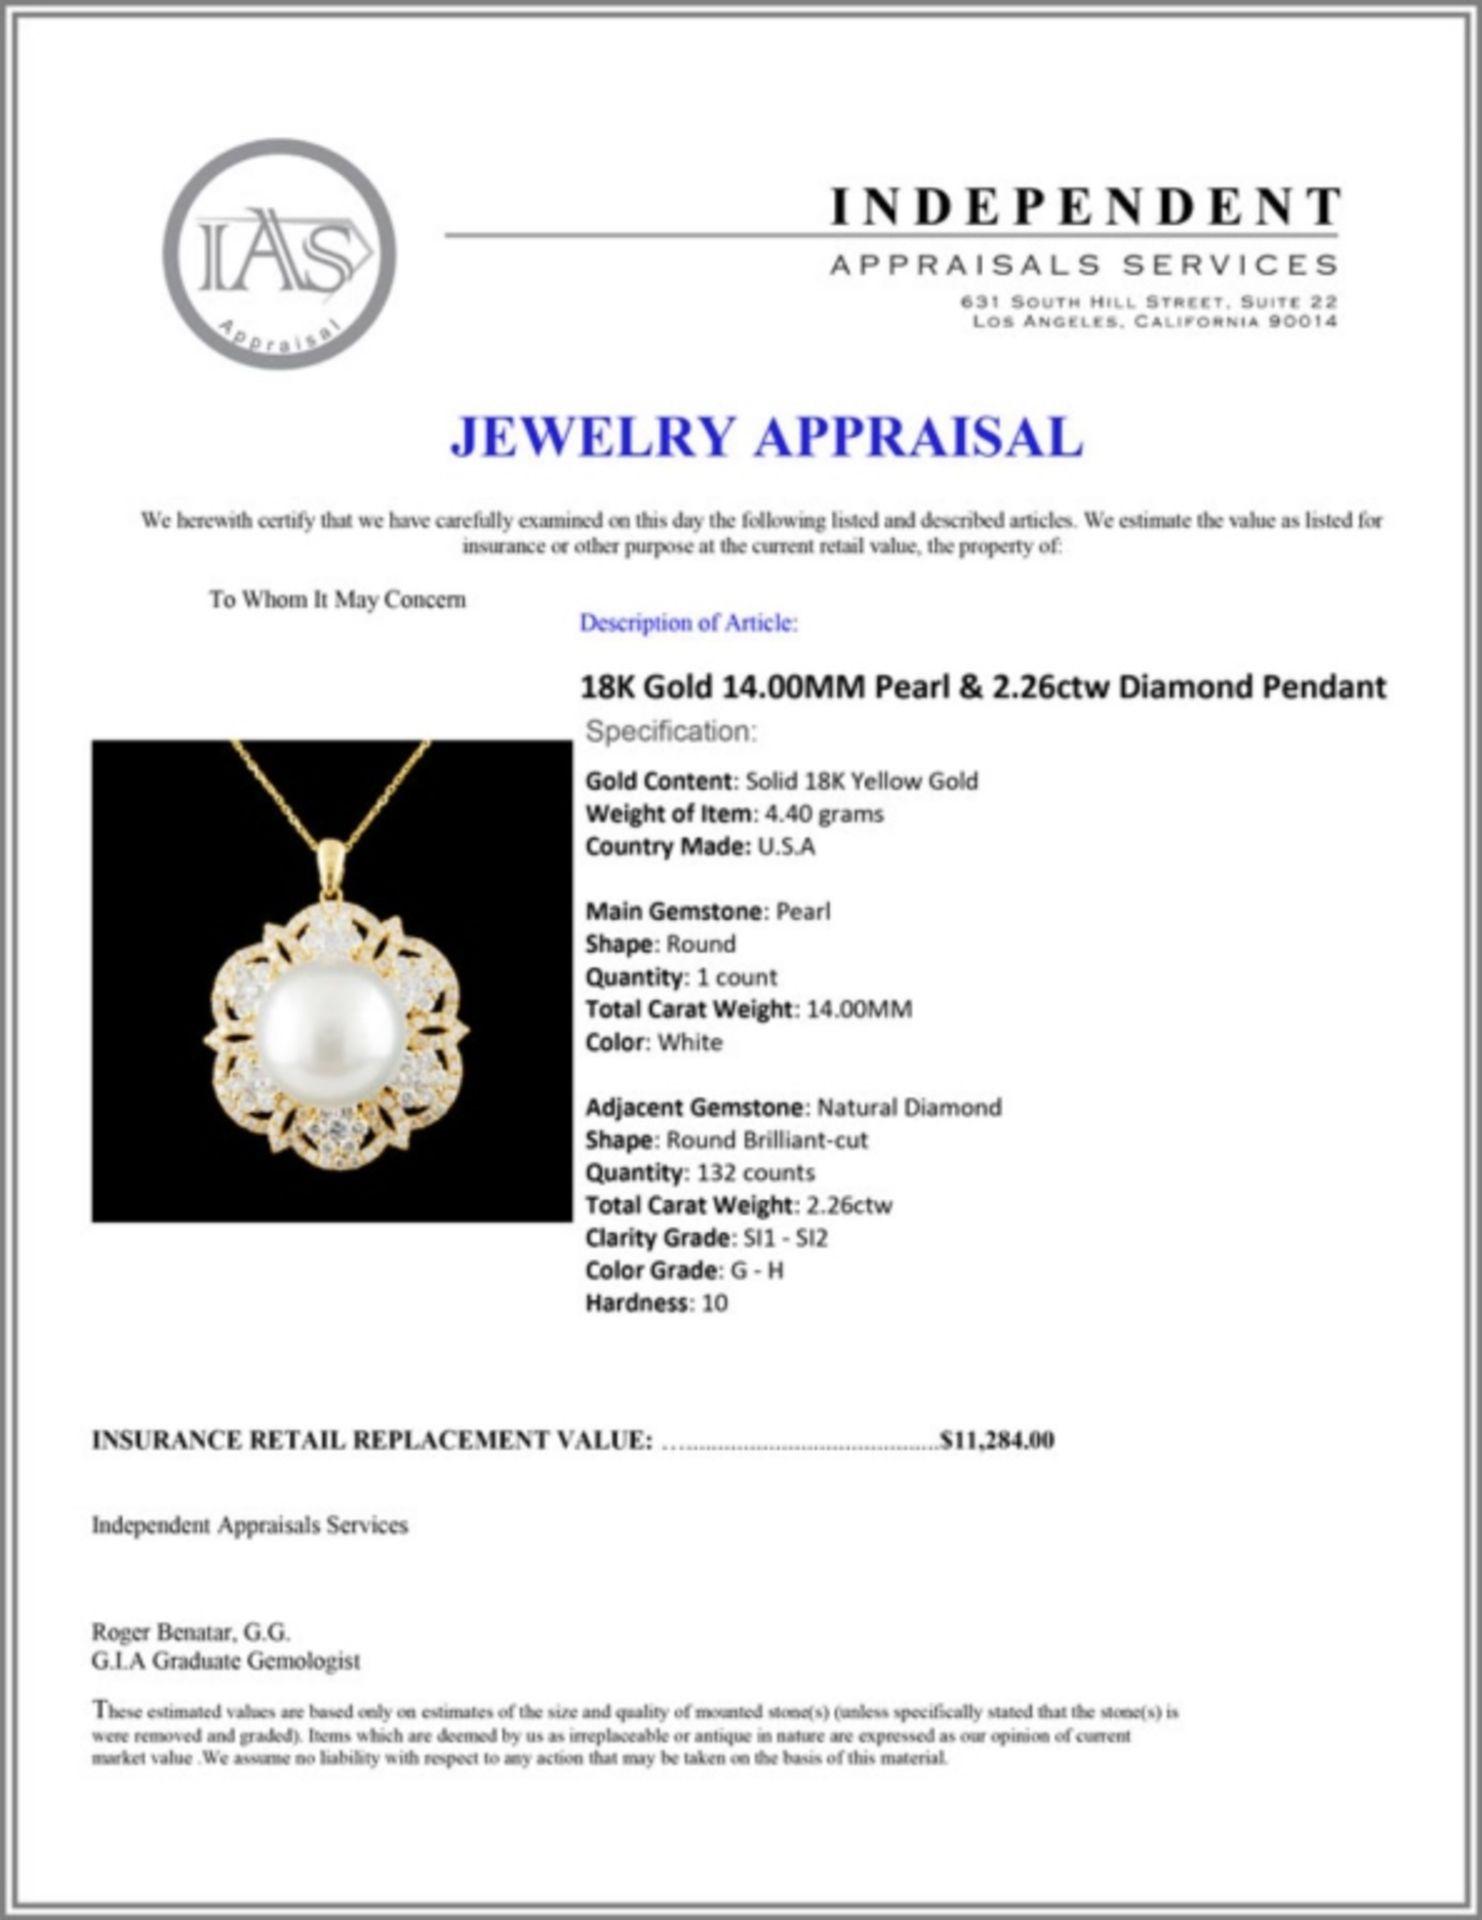 18K Gold 14.00MM Pearl & 2.26ctw Diamond Pendant - Image 4 of 4